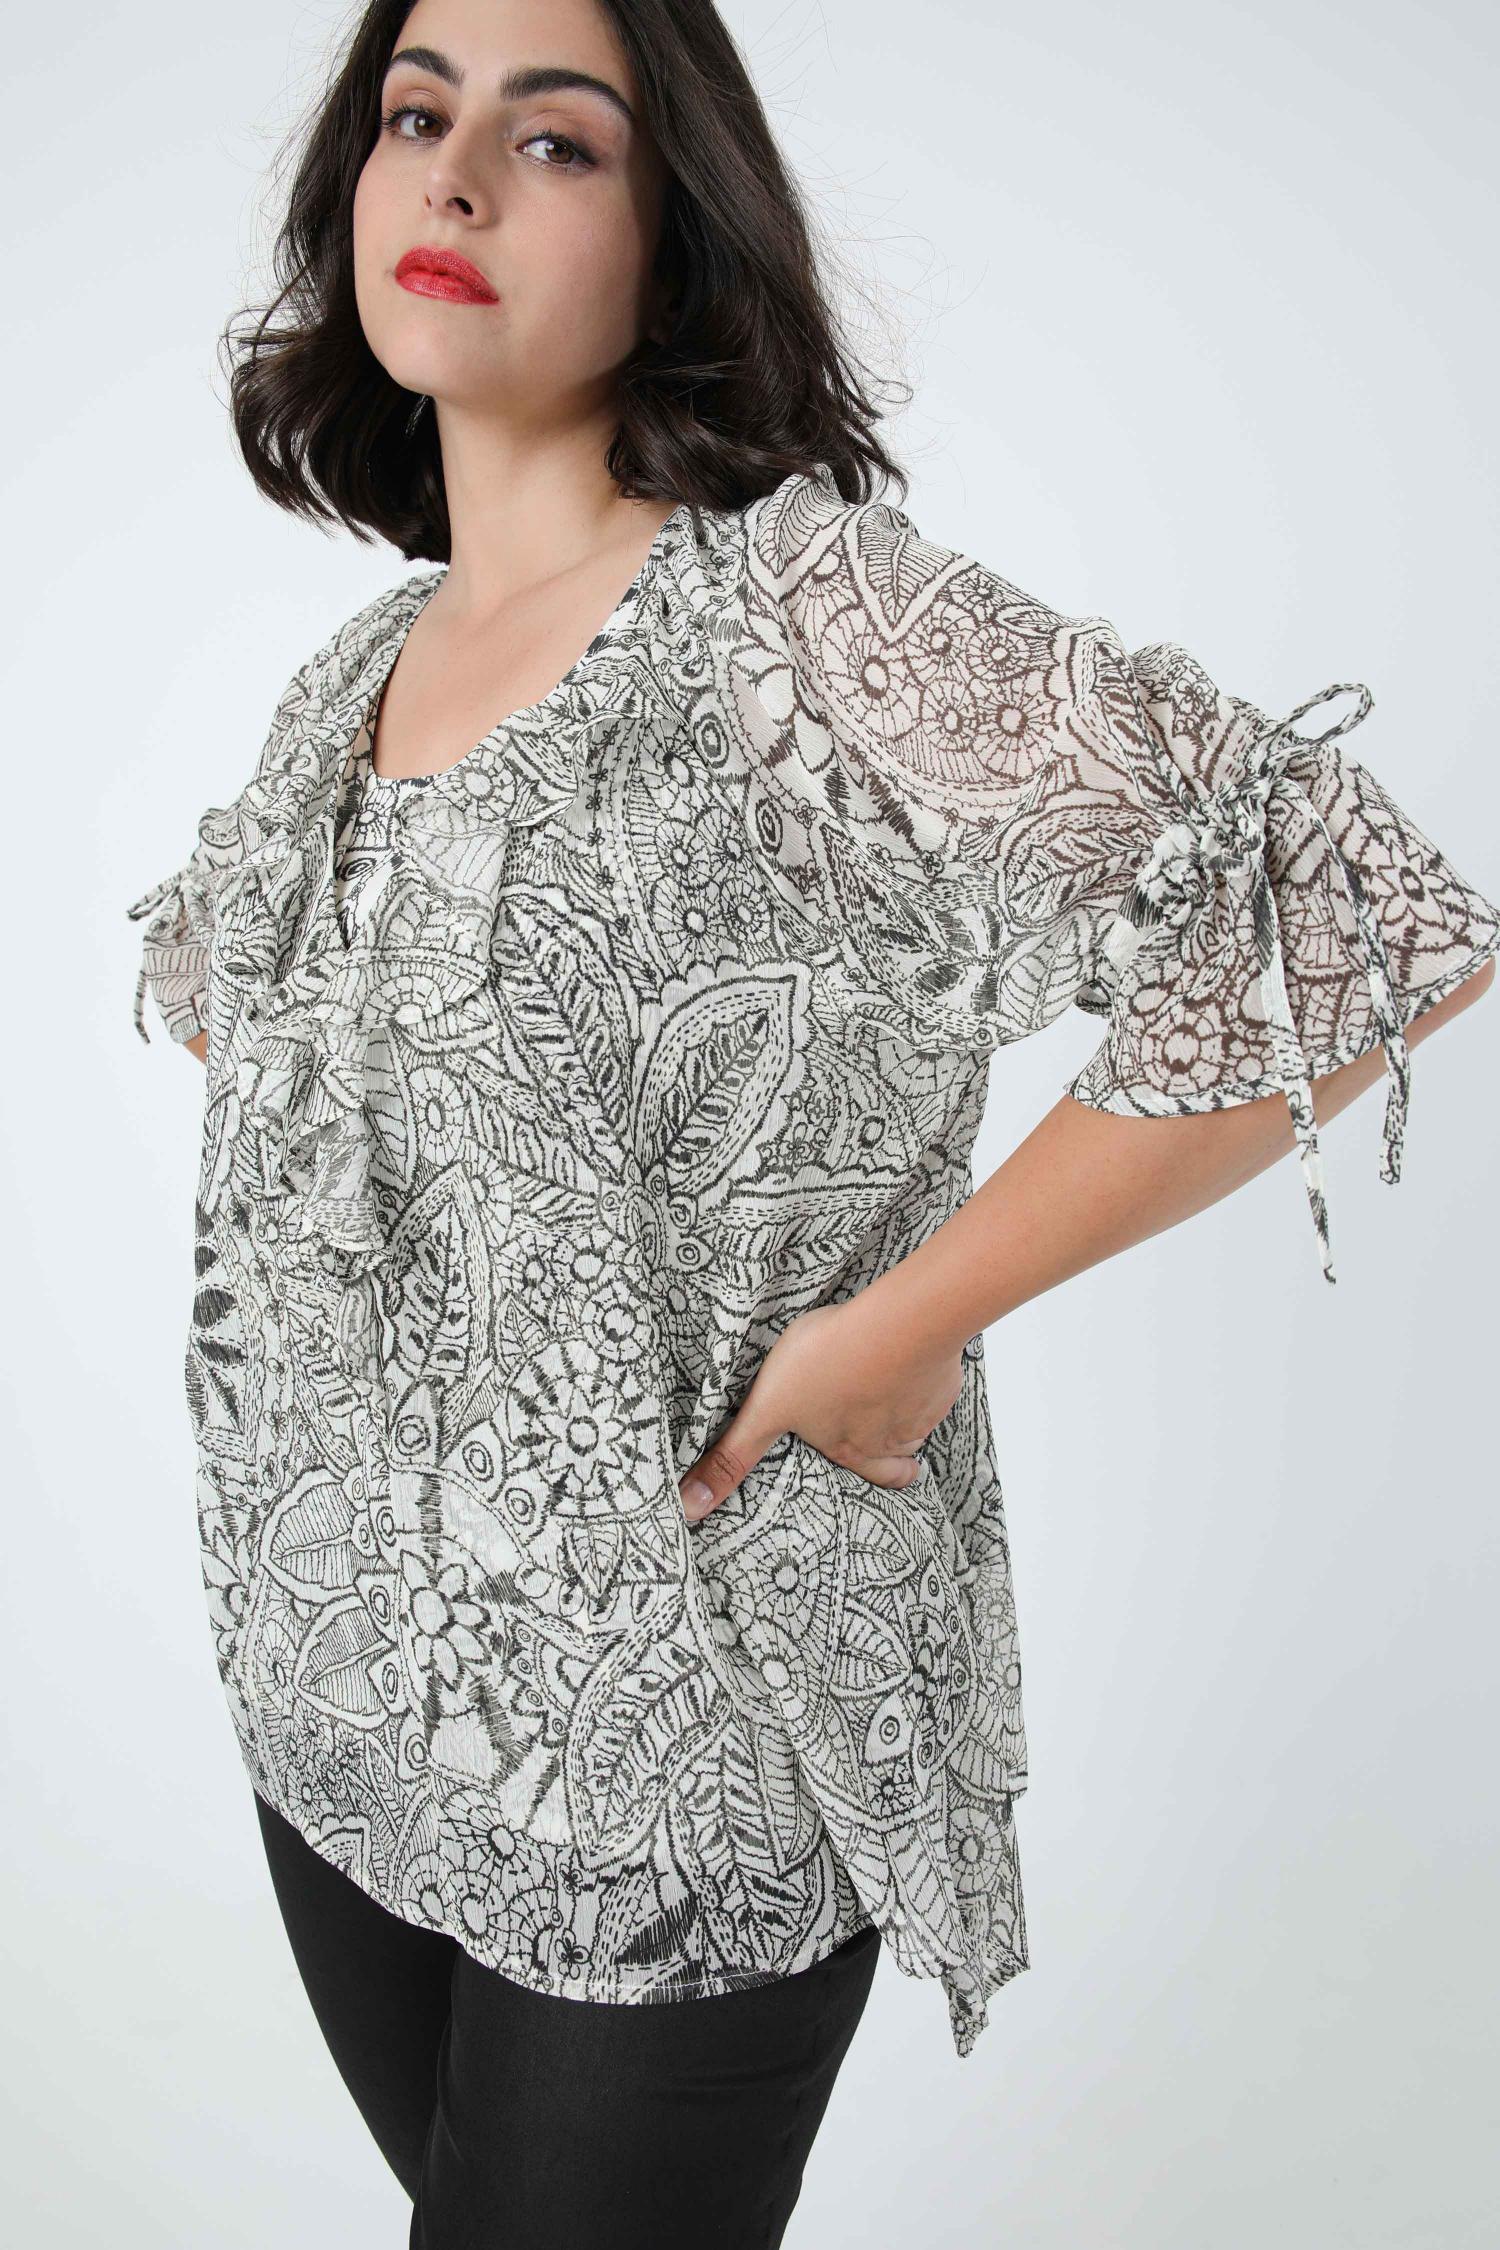 Printed blouse in eoko-tex fabric (August 20/25)